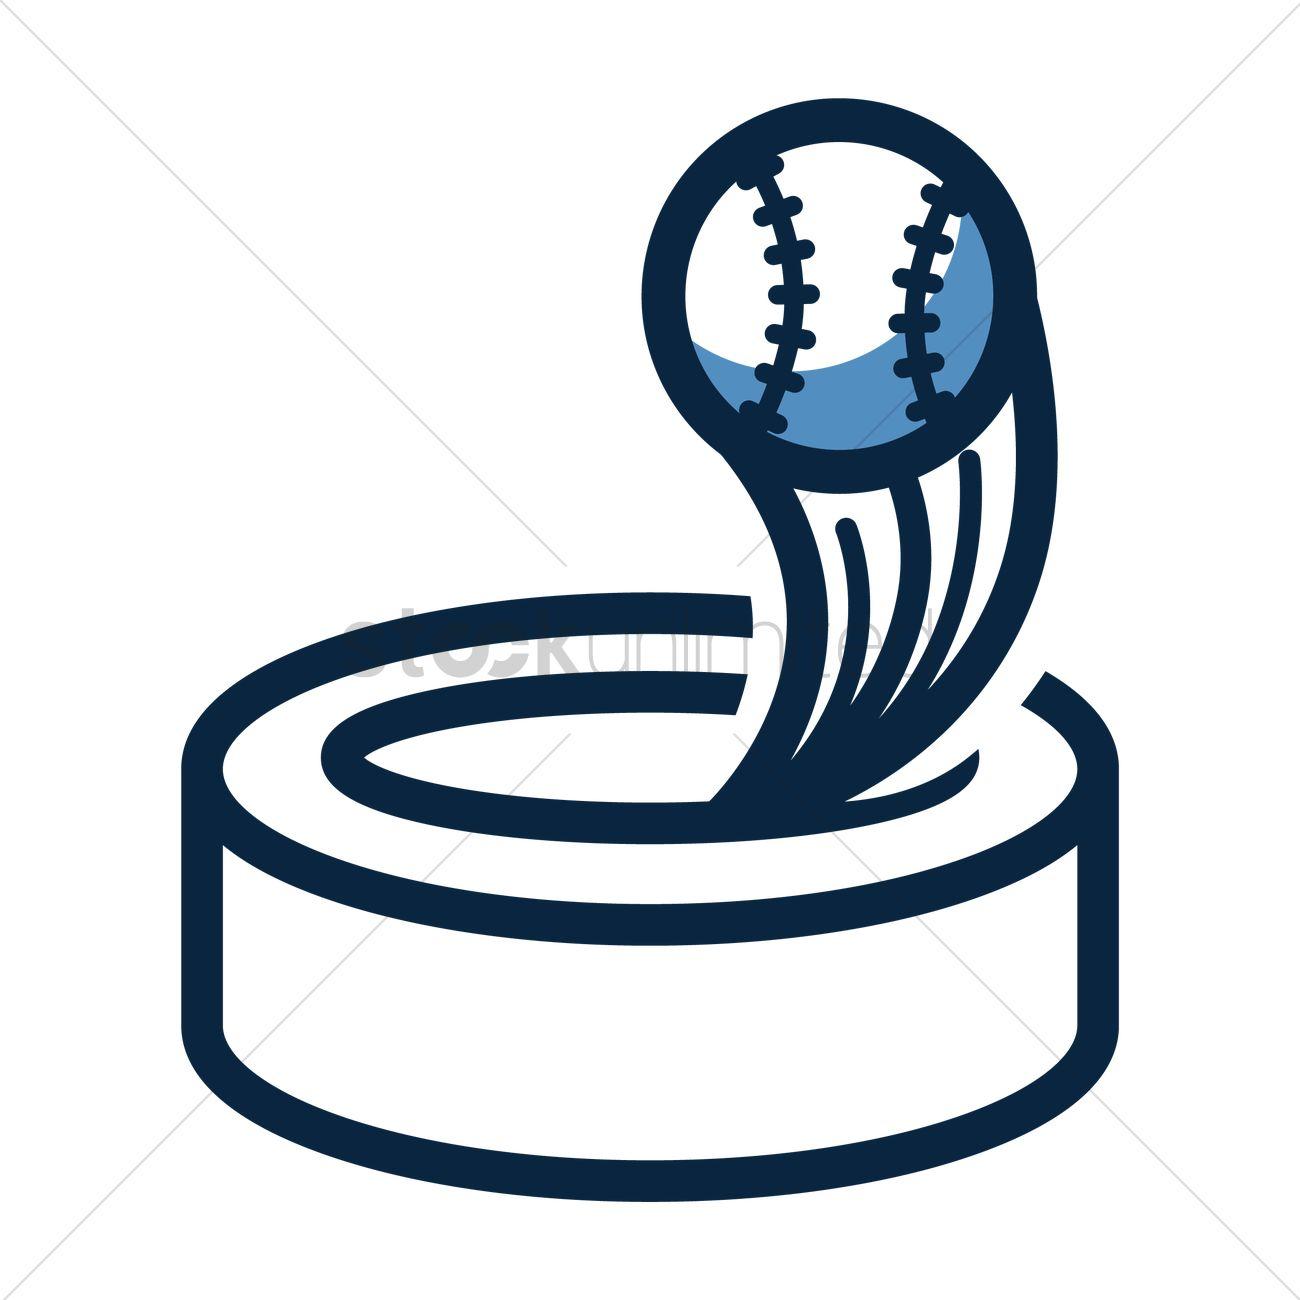 1300x1300 Baseball Stadium And Homerun Icon Vector Image